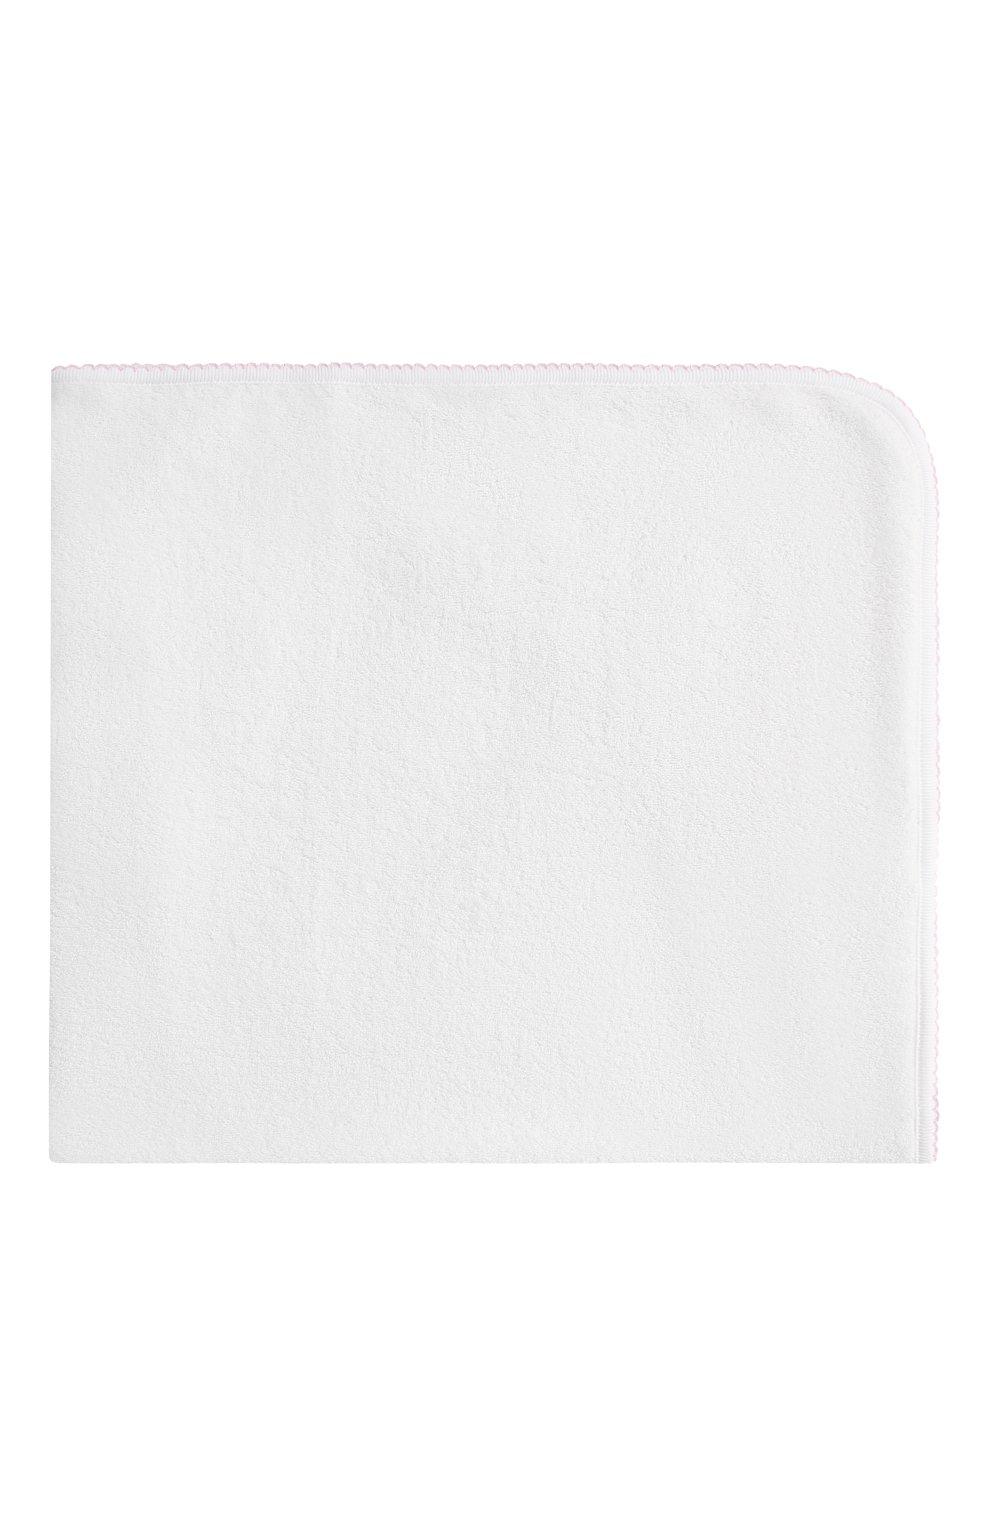 Детского комплект из полотенца и рукавицы KISSY KISSY розового цвета, арт. 48609 | Фото 3 (Материал: Текстиль, Хлопок)